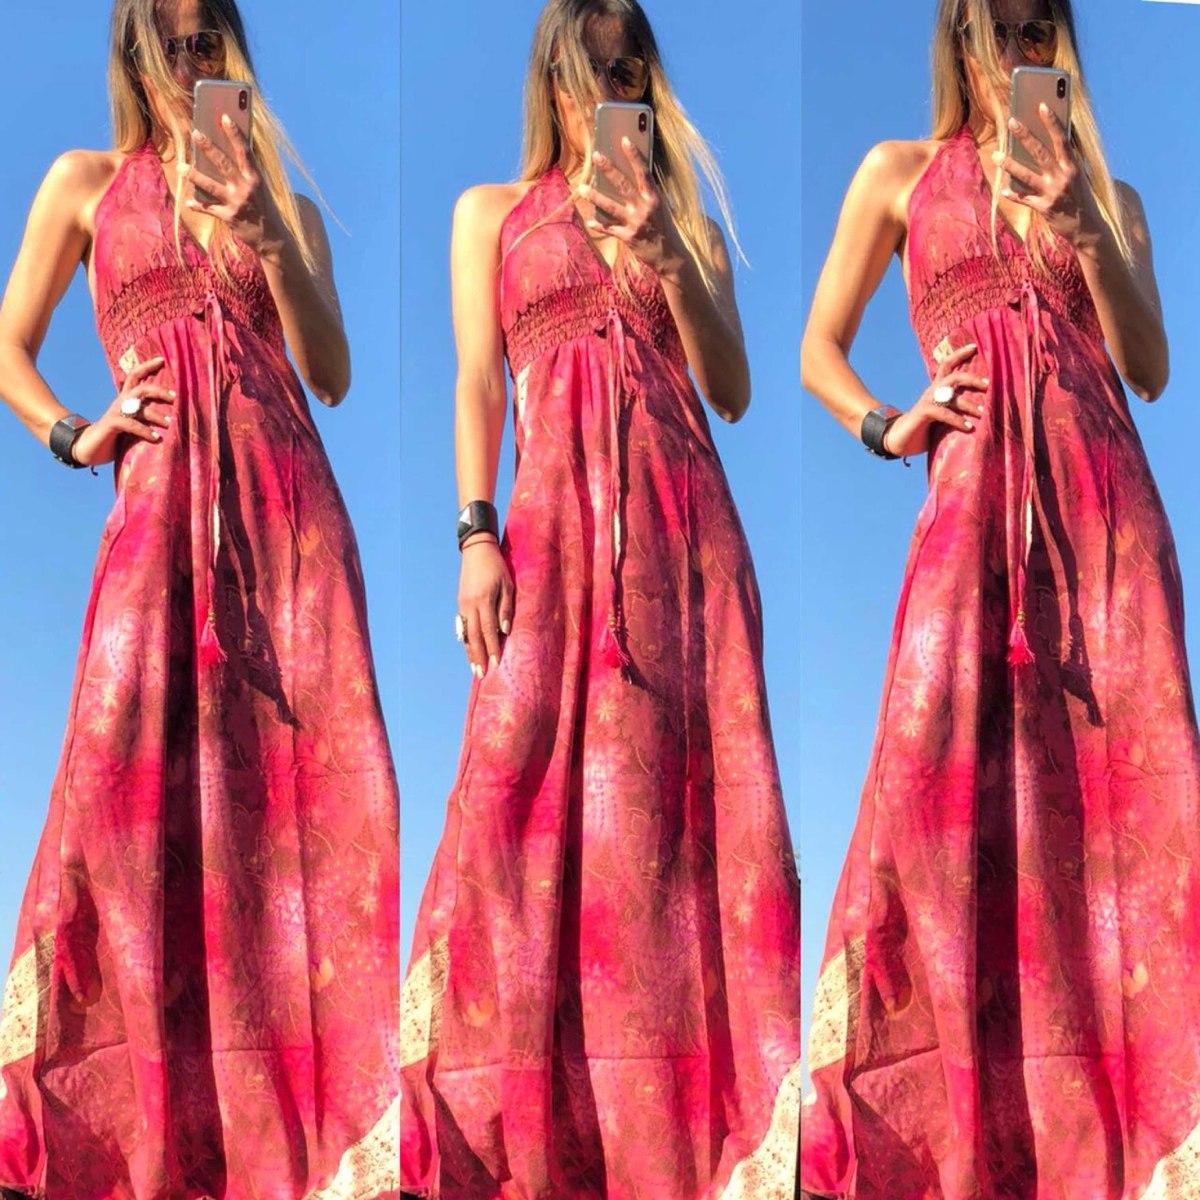 c517d8e6c vestido largo mujer importado estampado fibrana escote. Cargando zoom.